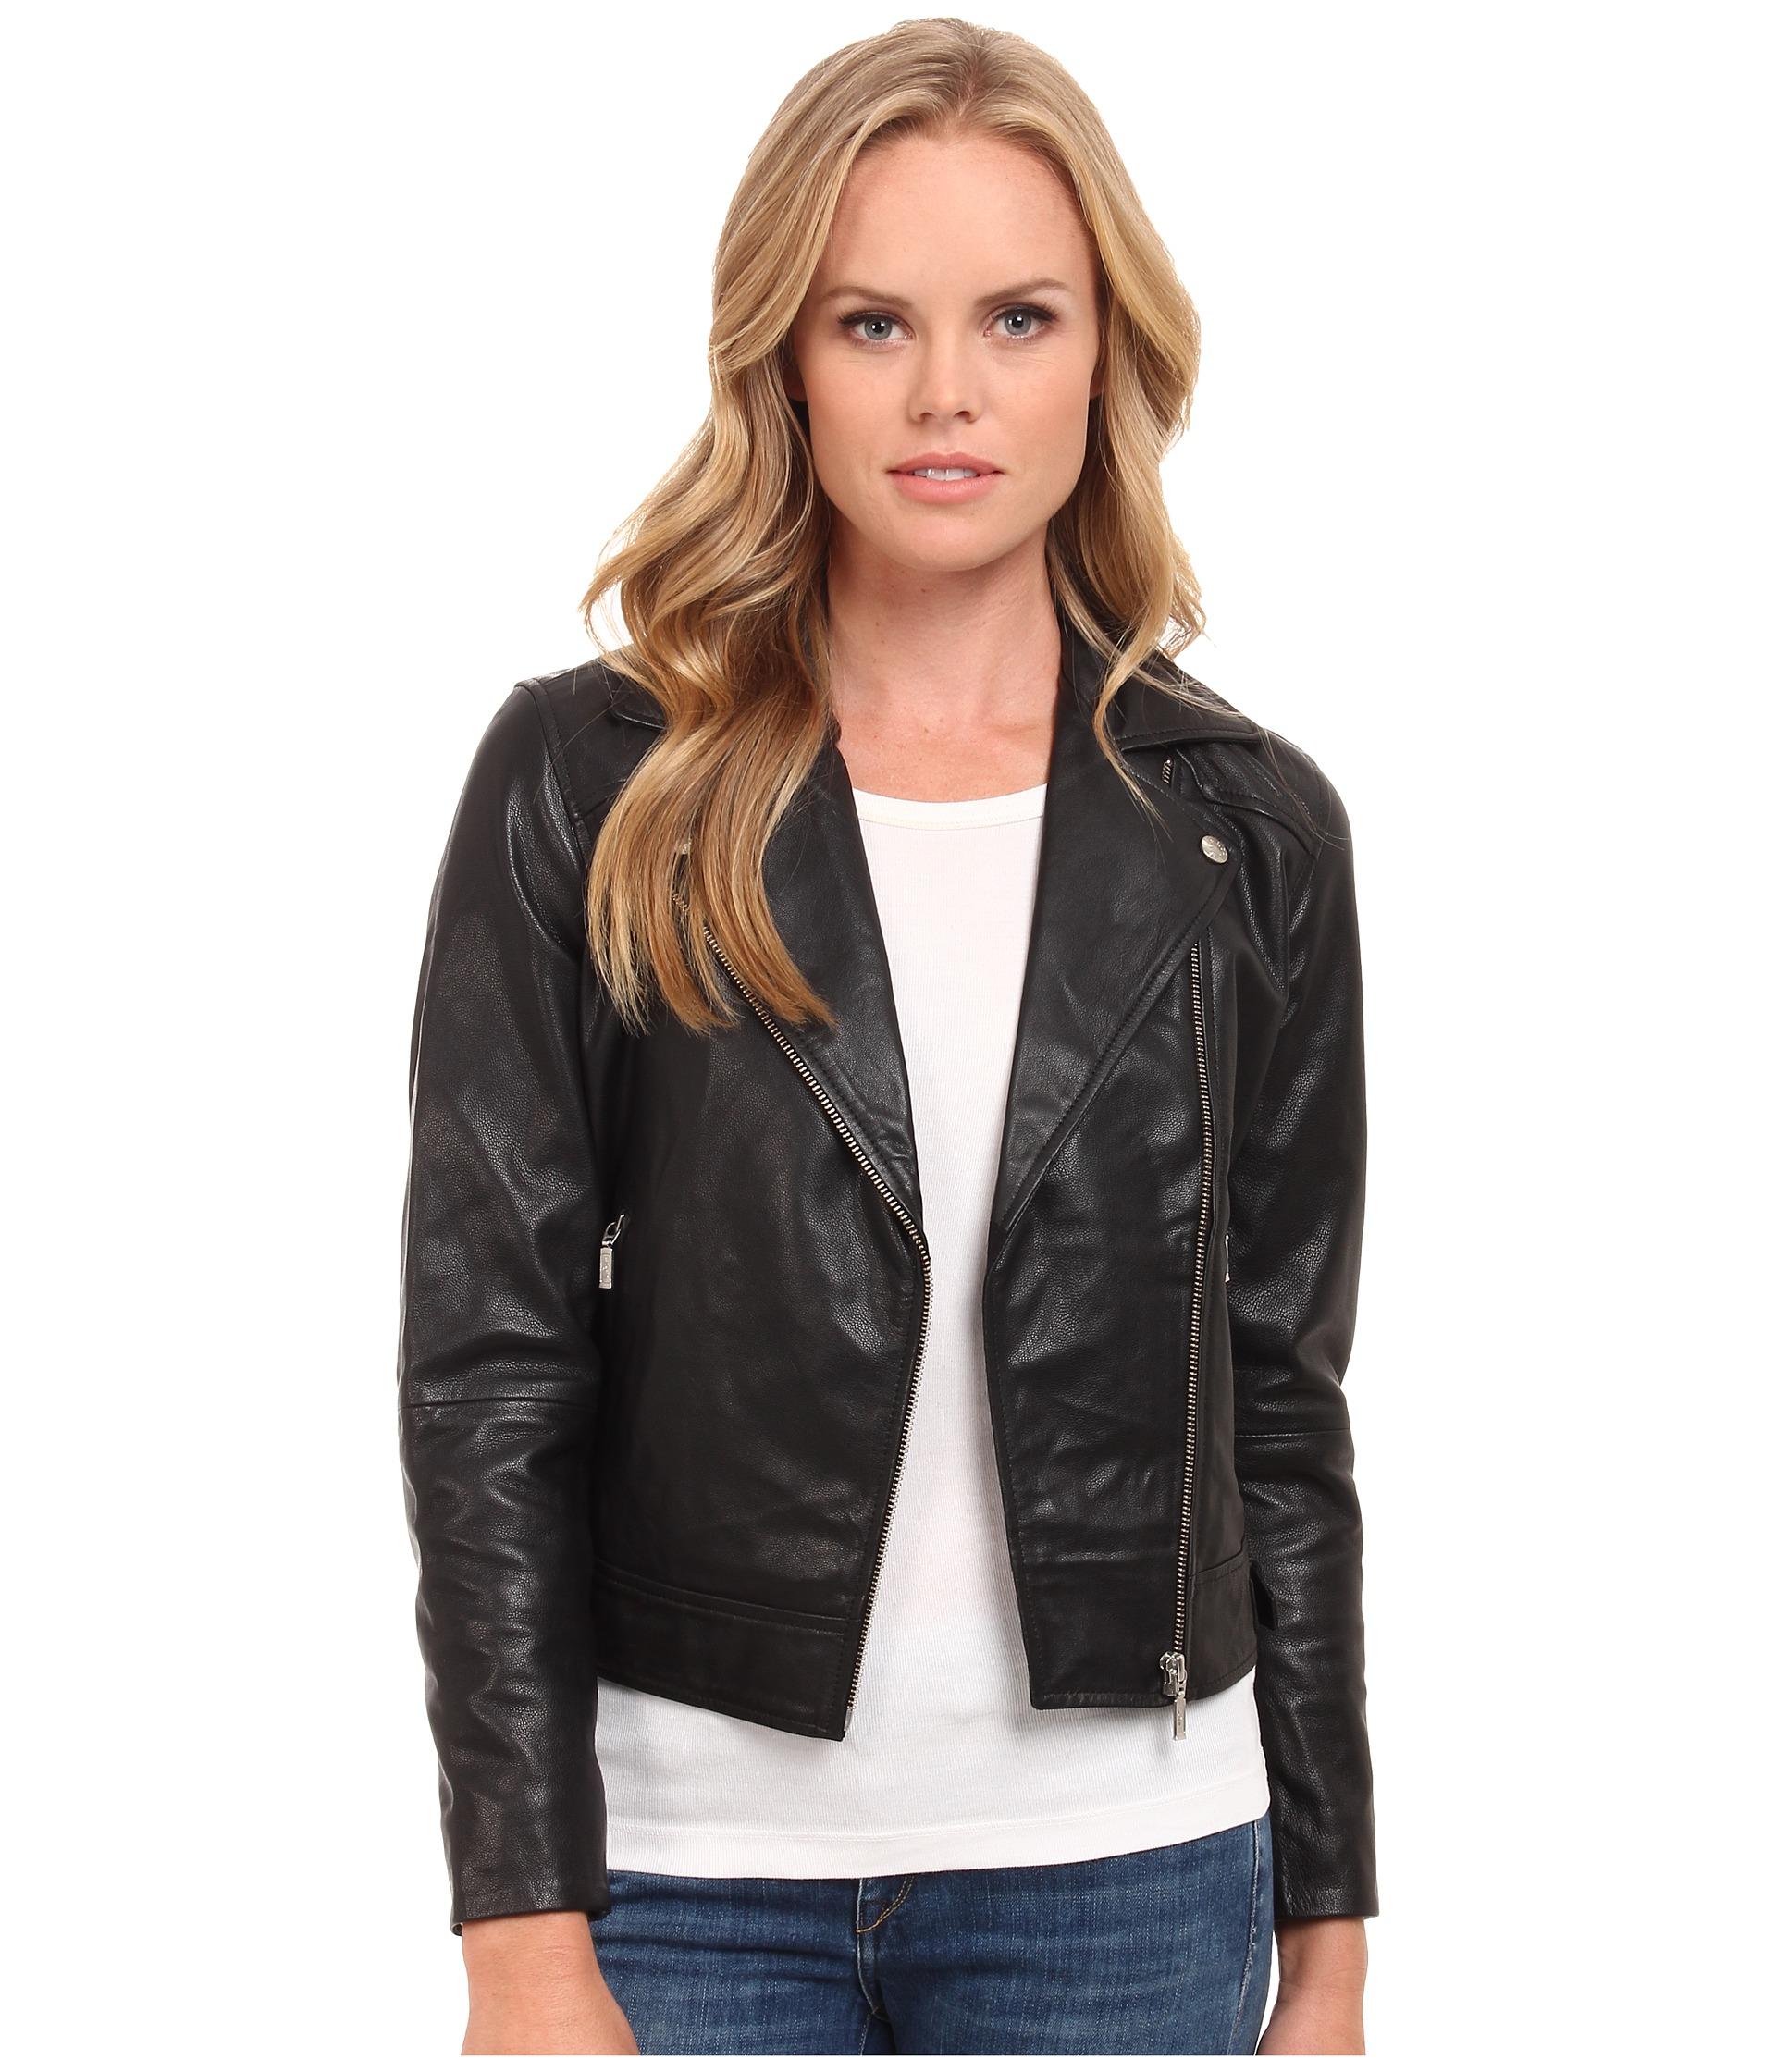 Lyst - Levi'S Levi's Leather Biker Jacket